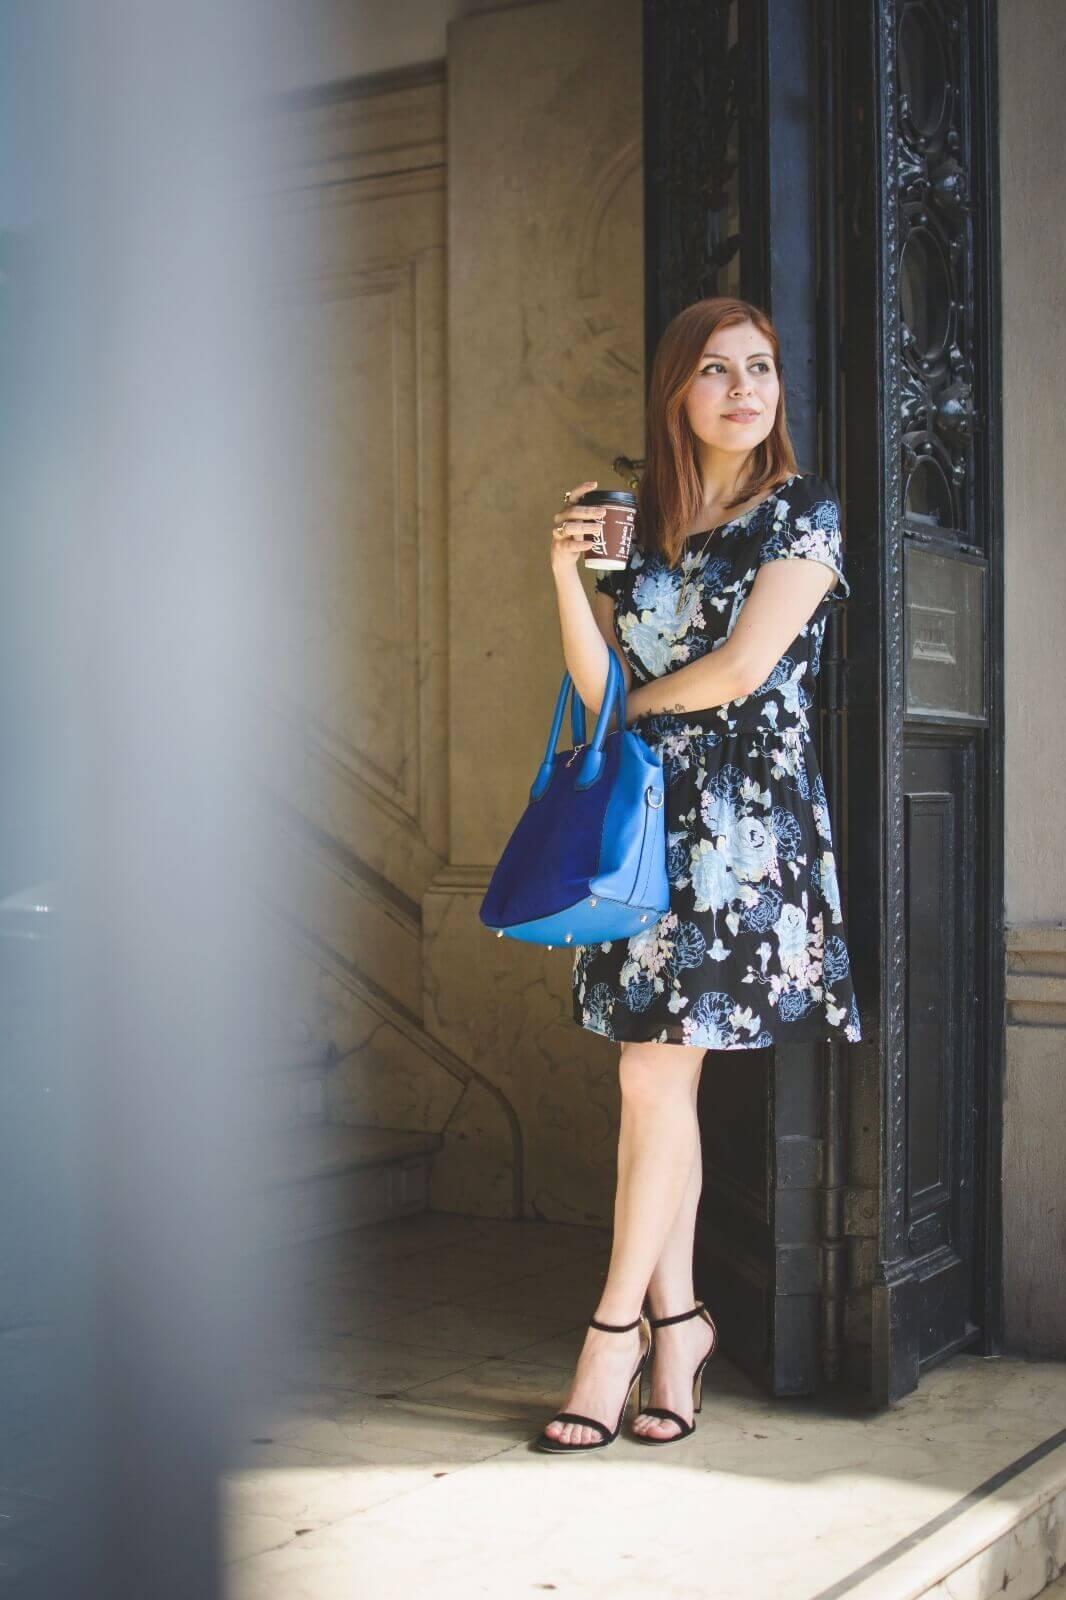 gamiss-black-strappy-sandals-blue-floral-dress-rosegal-cobalt-blue-tote-bag-deborah-ferrero-style-by-deb04